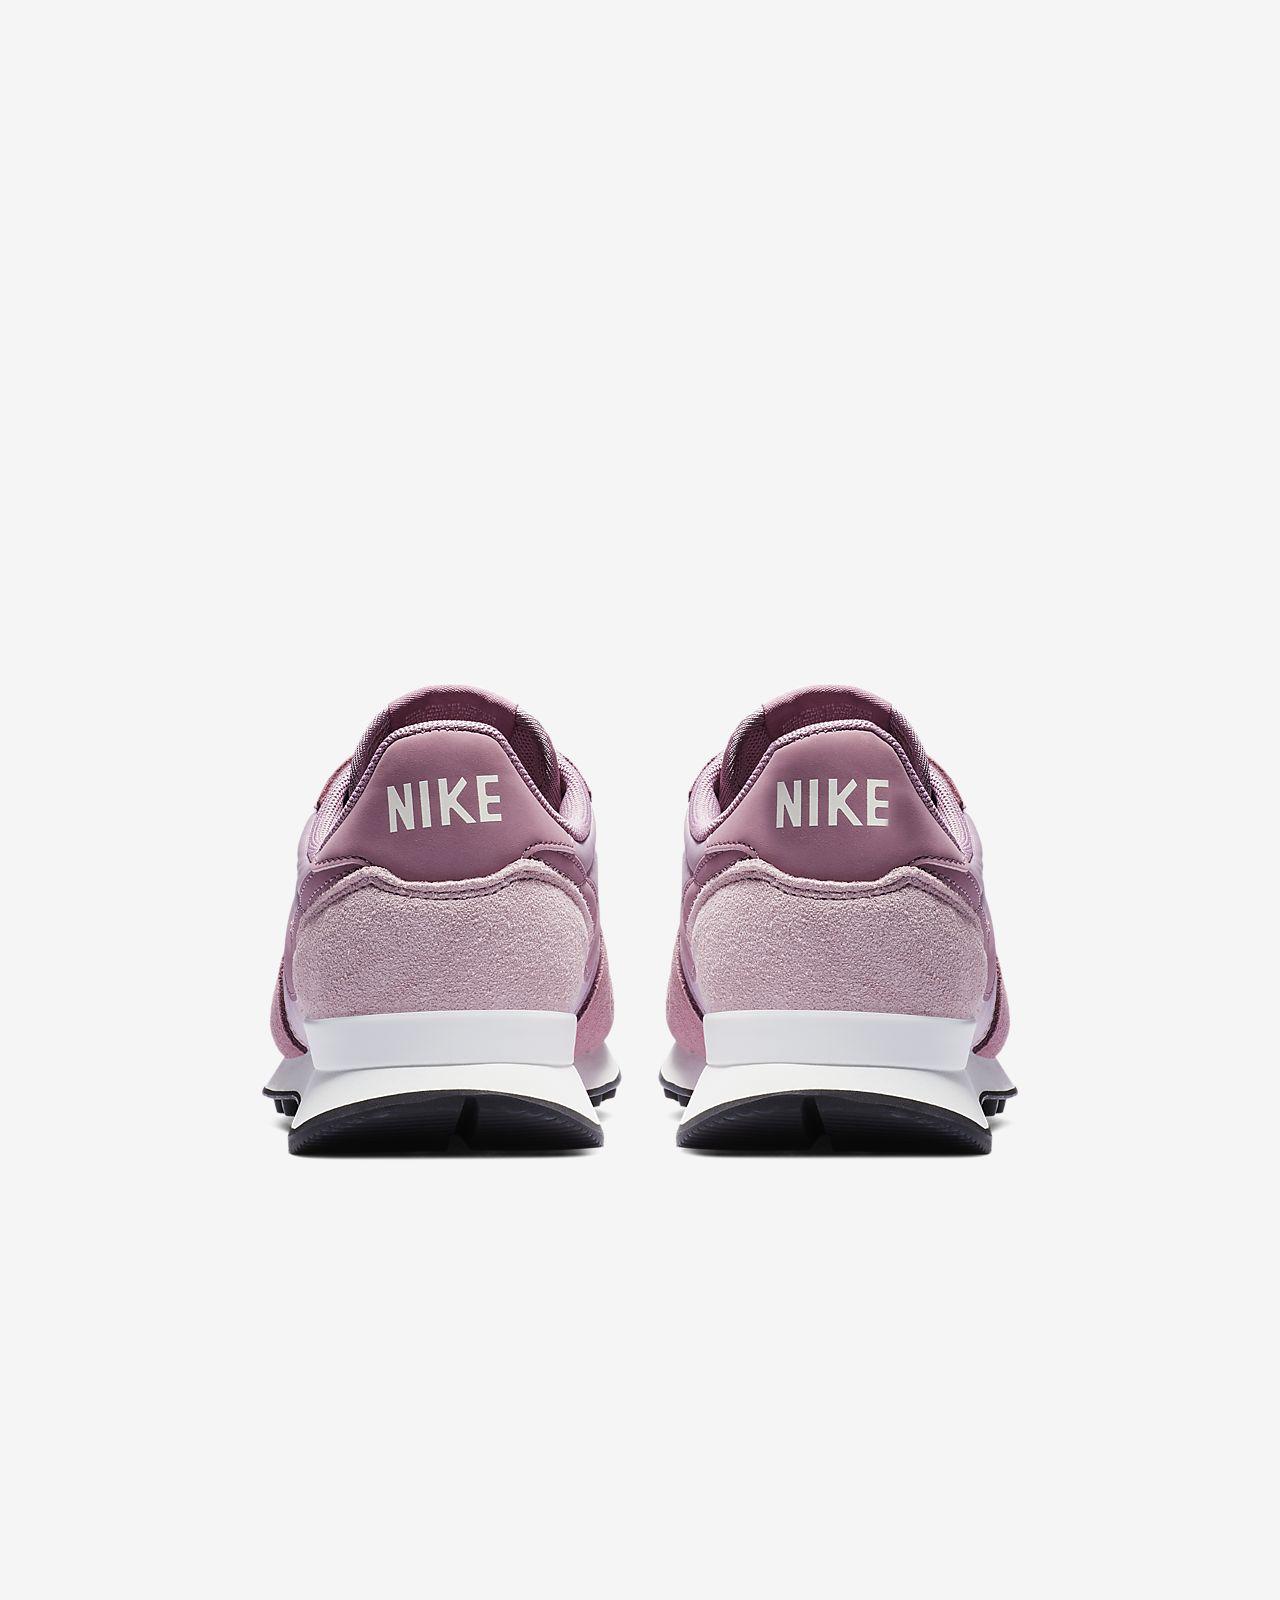 22421e87c50e Low Resolution Nike Internationalist Women s Shoe Nike Internationalist  Women s Shoe